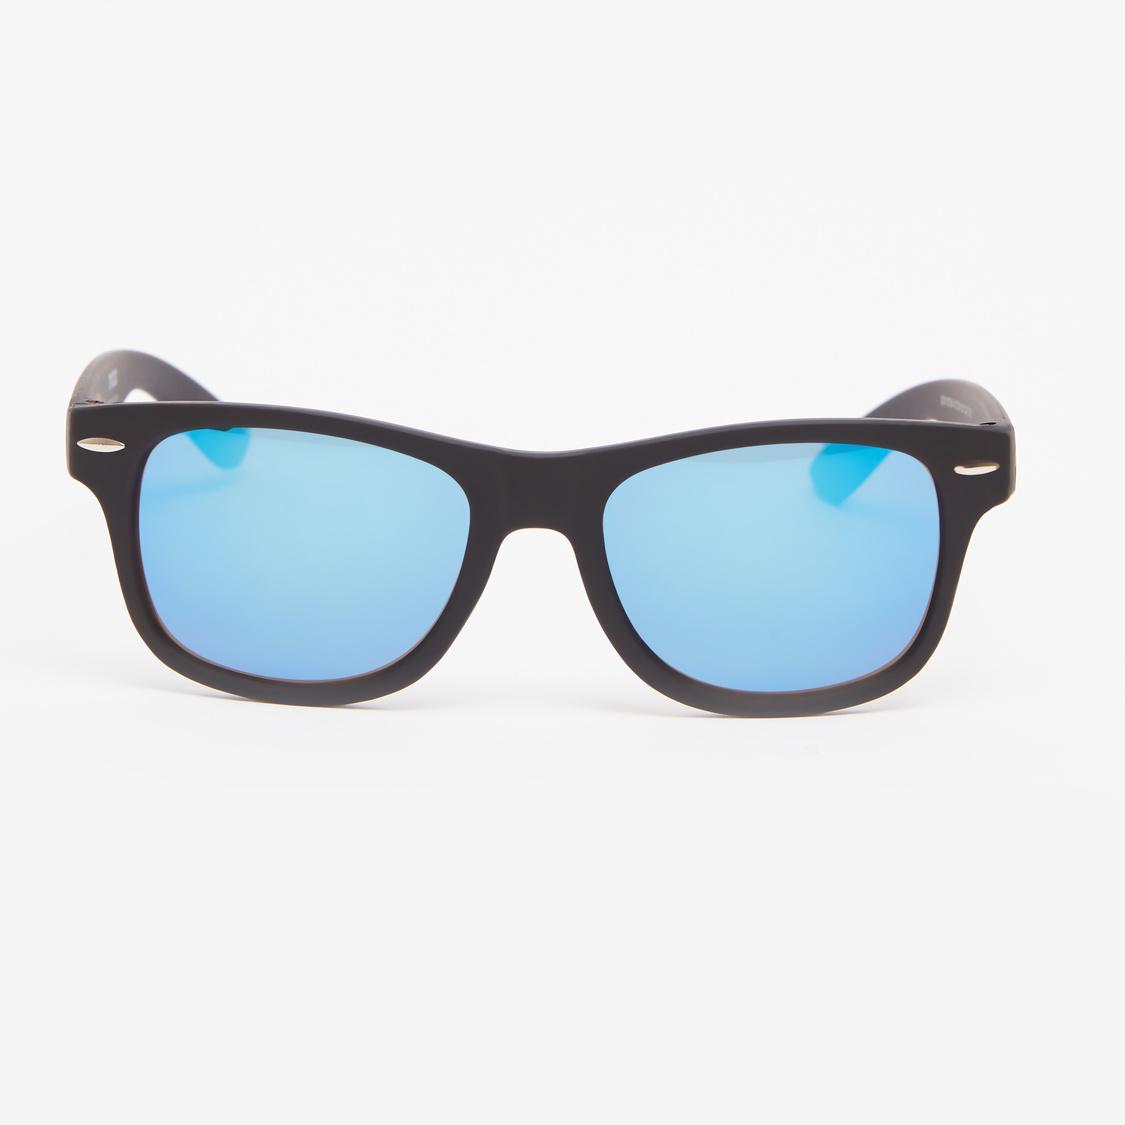 Full Rim Wayfarer Sunglasses with Nose Pads